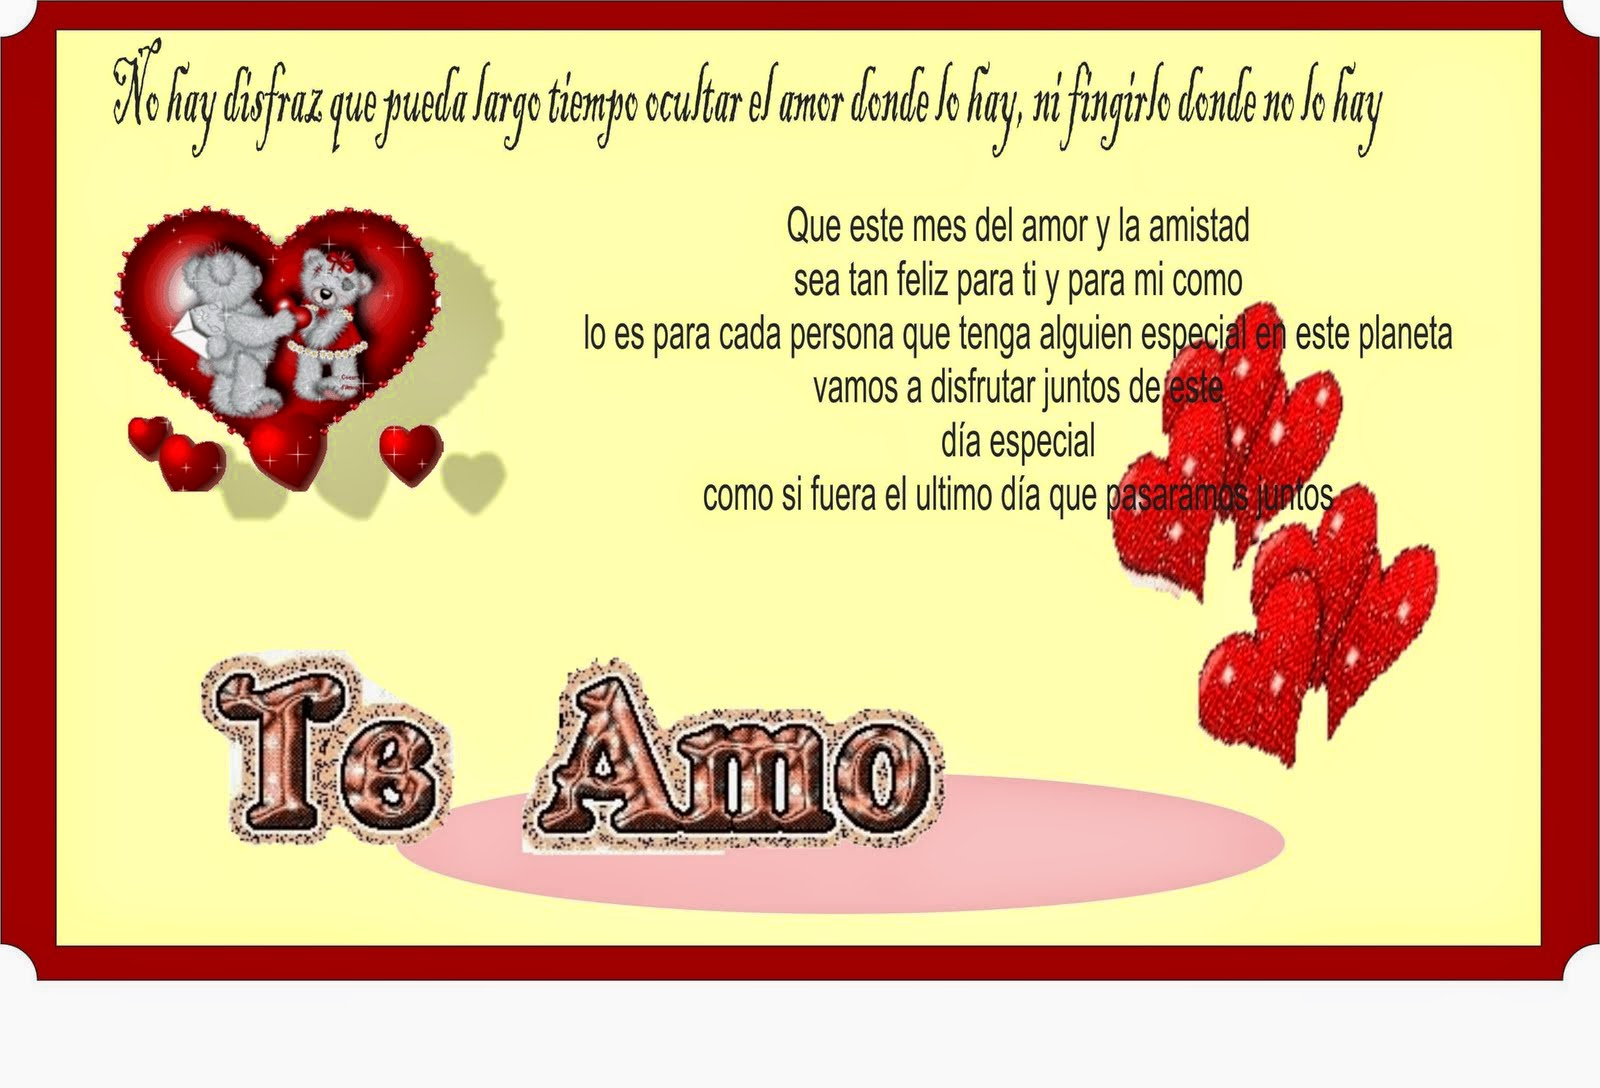 imagenes de cartas de amor cartas de amor frases bonitas mensajes de amor